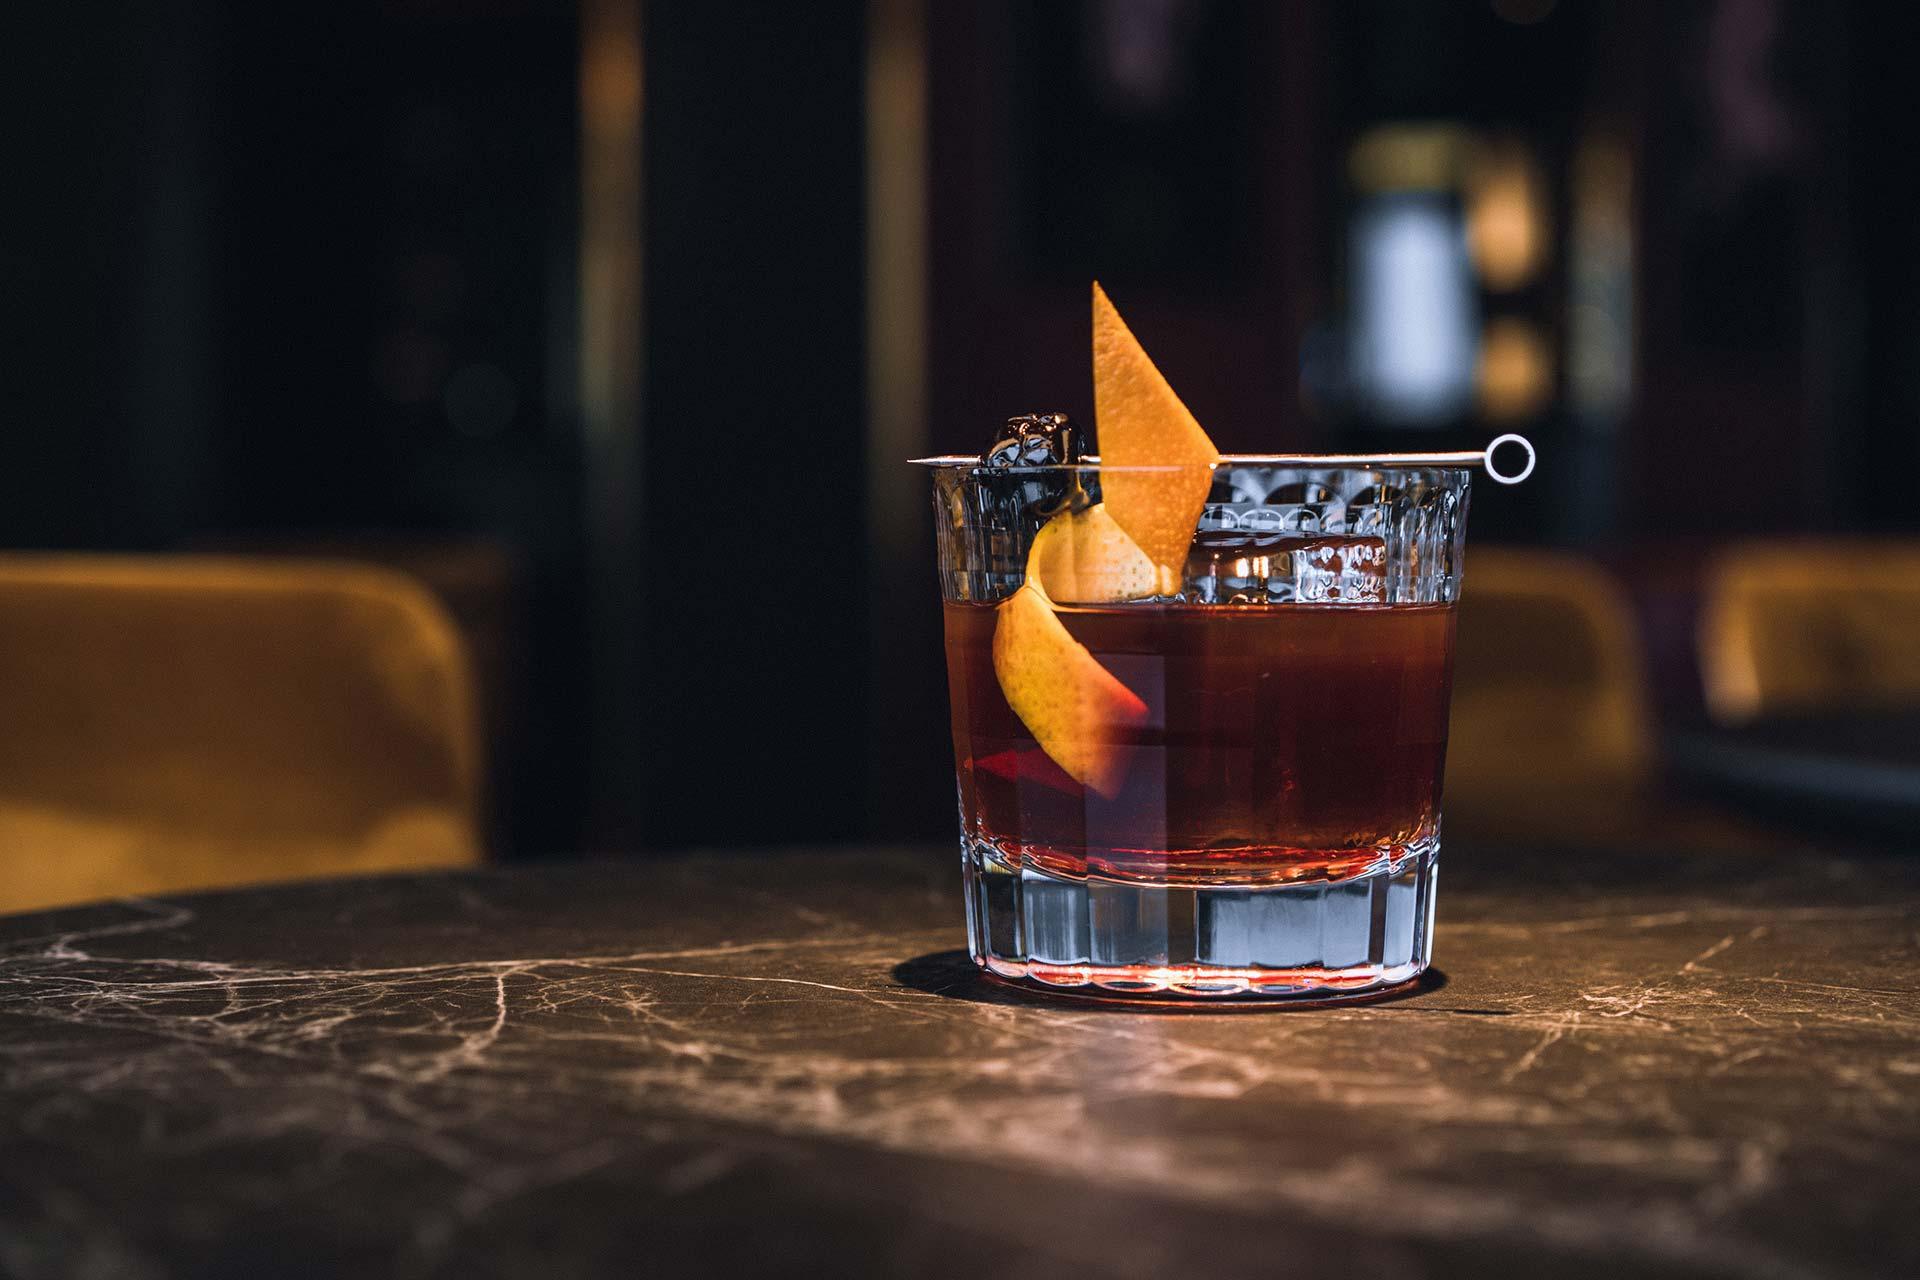 drinks 01 - Drinks